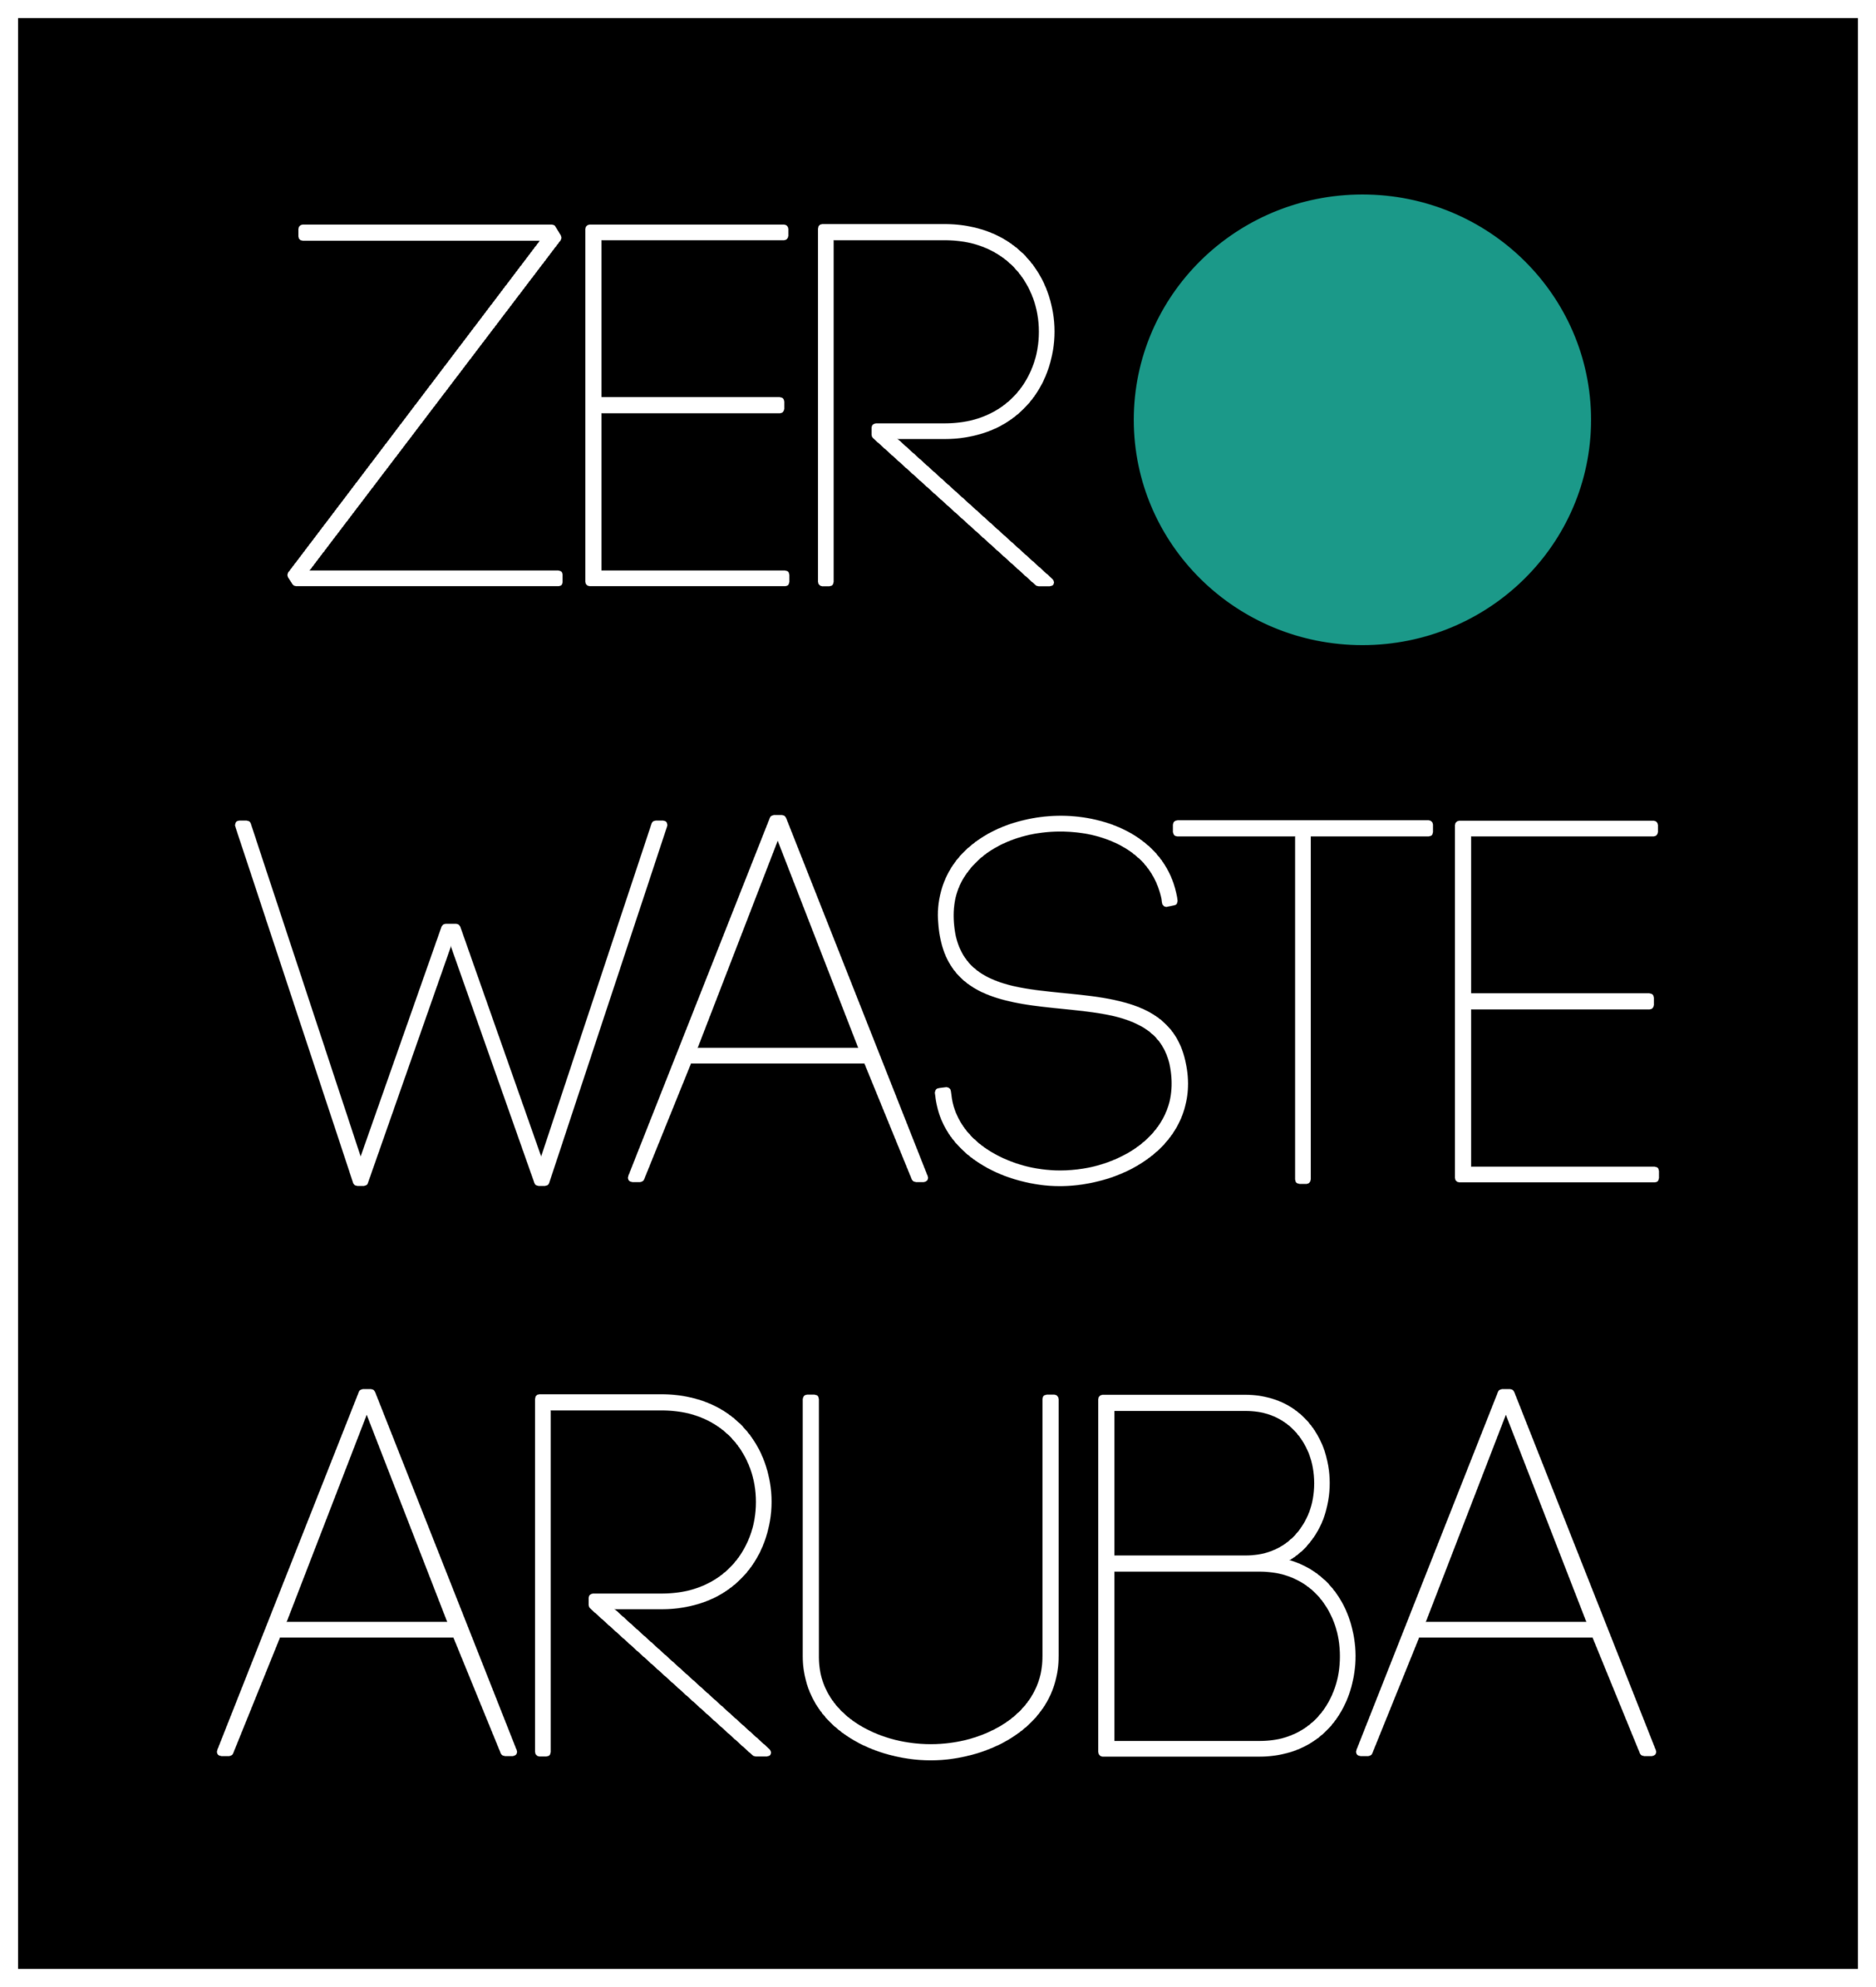 Zero Waste Aruba